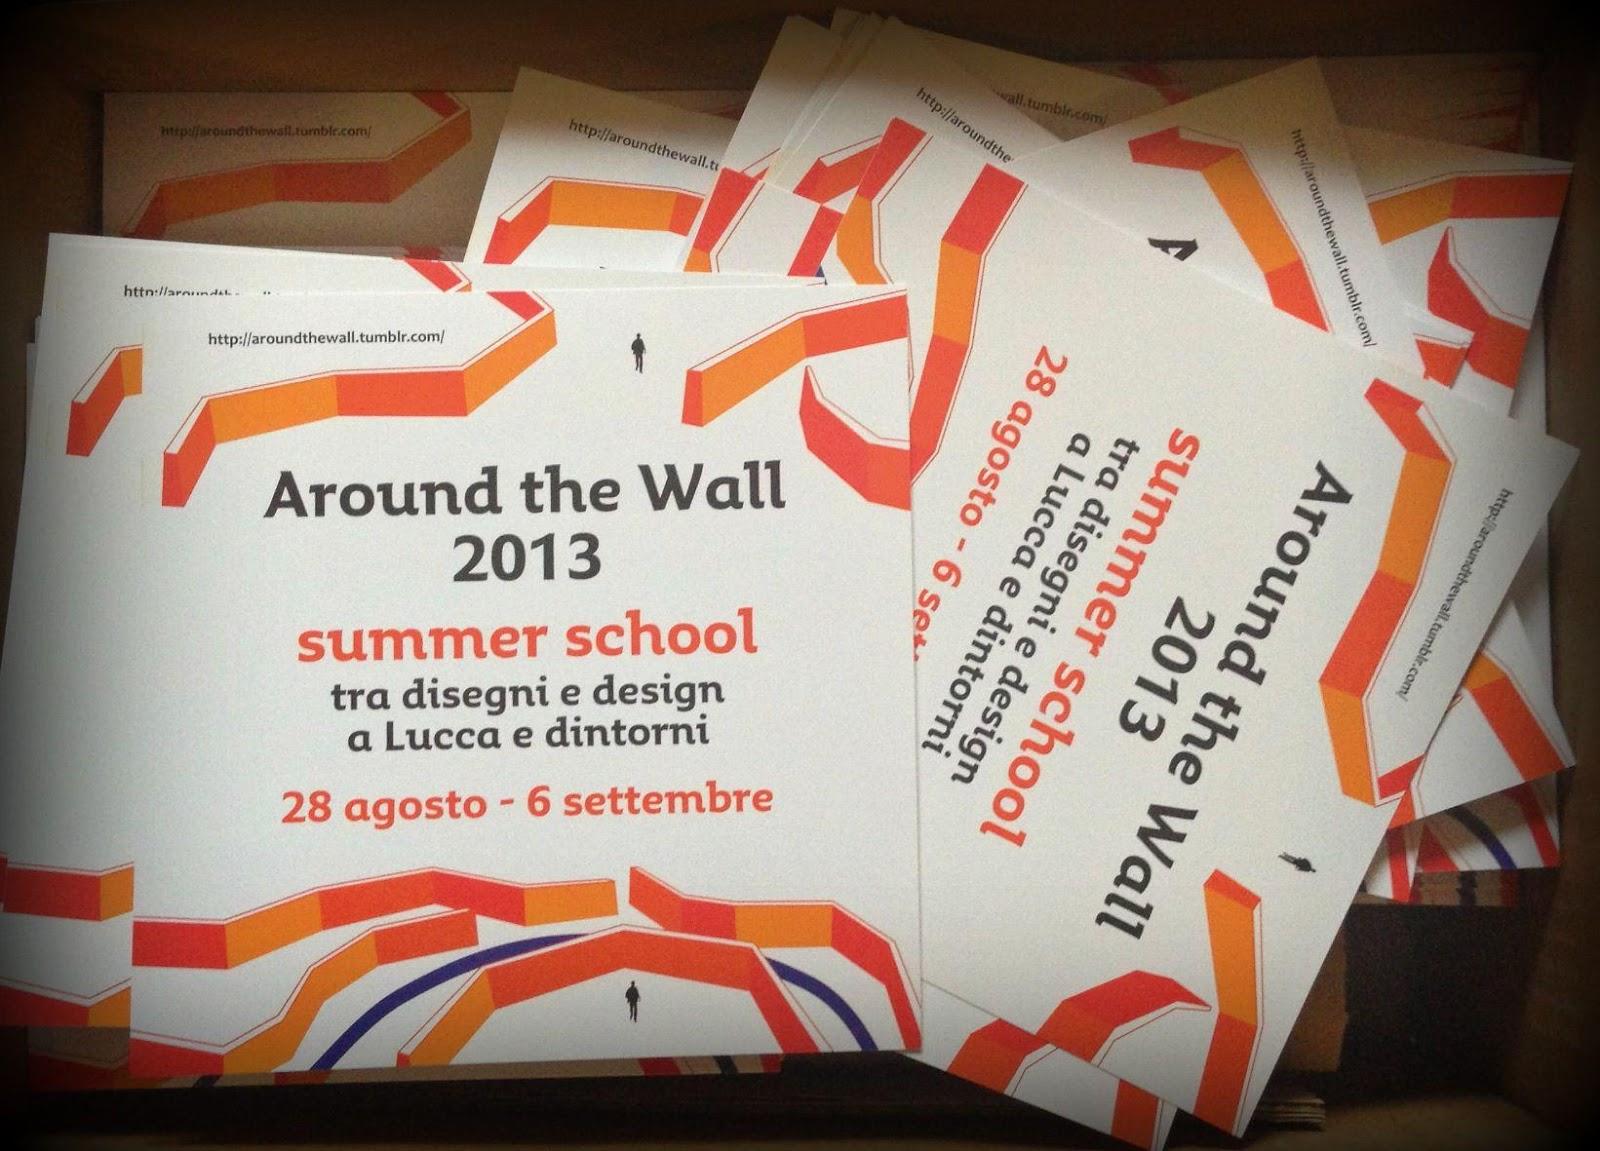 ATW 2013 - international summer school at Lucca